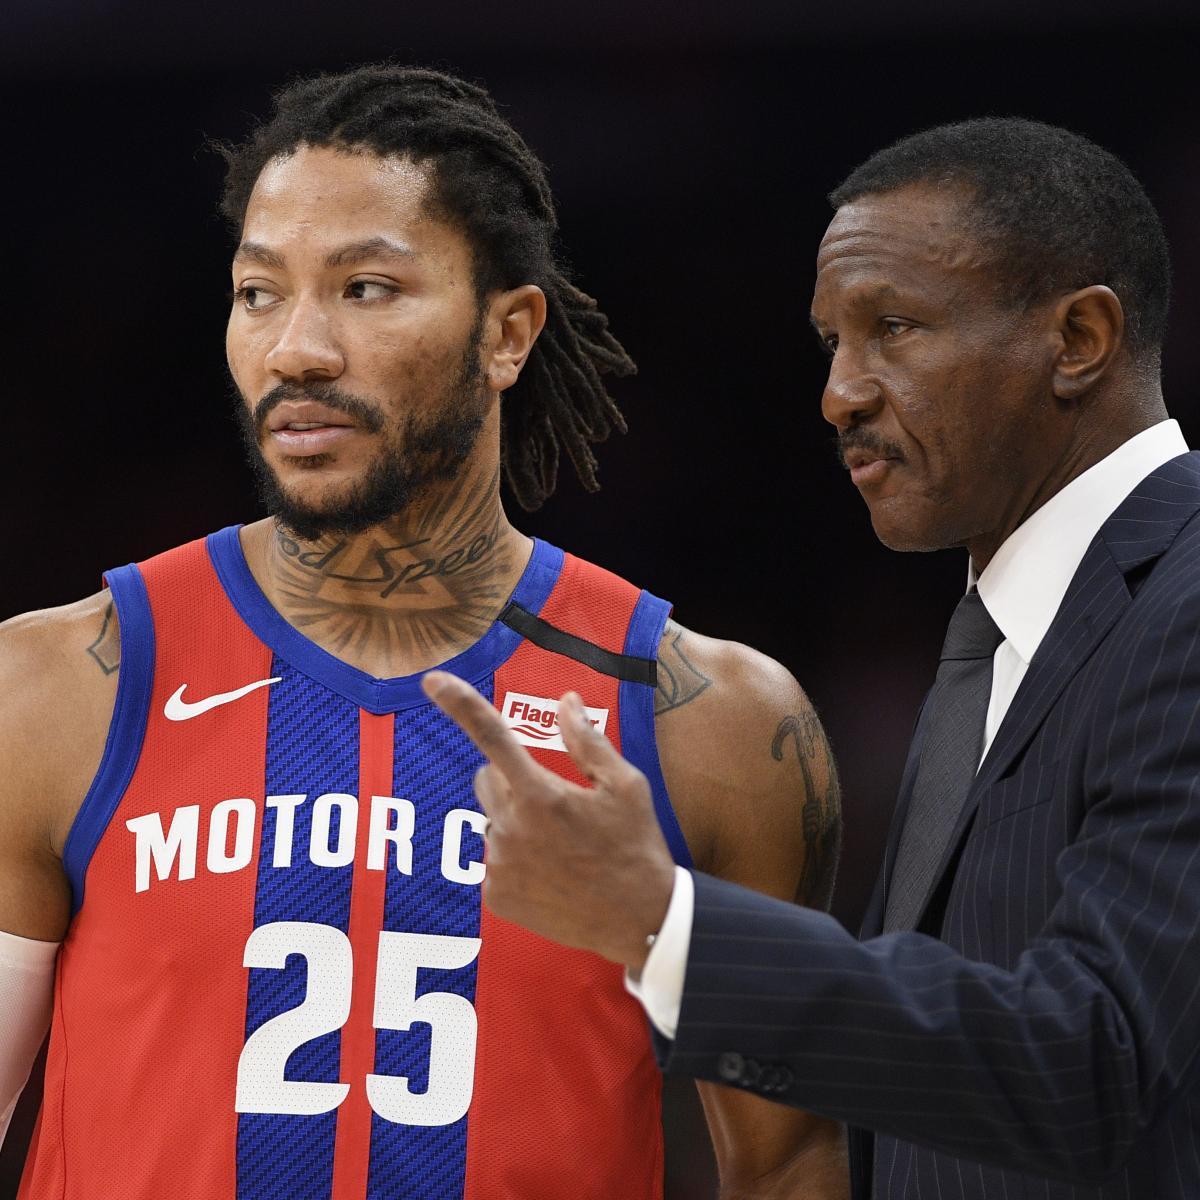 Derrick Rose Trade Rumors: Lakers, 76ers, More Interested in Pistons' PG